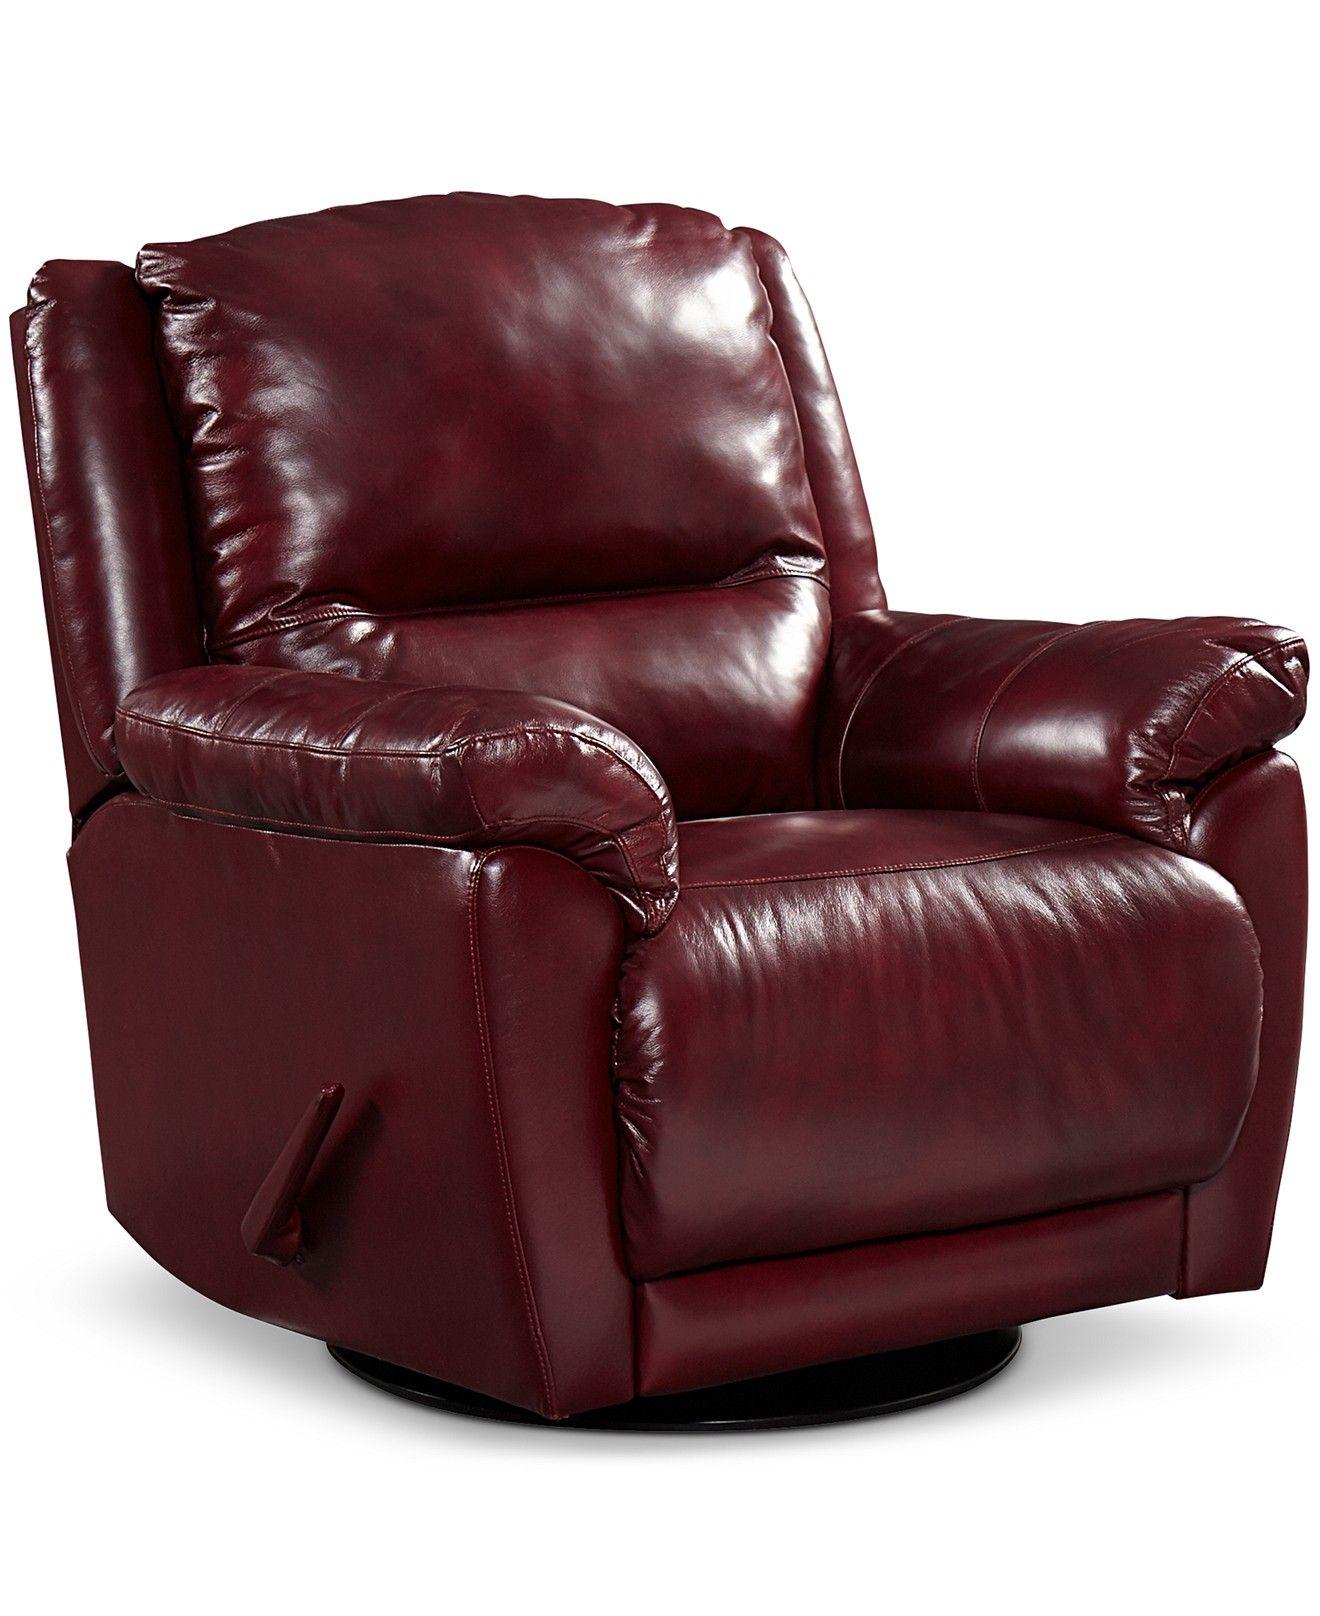 Hughstin Leather Swivel Glider Recliner Furniture Macy